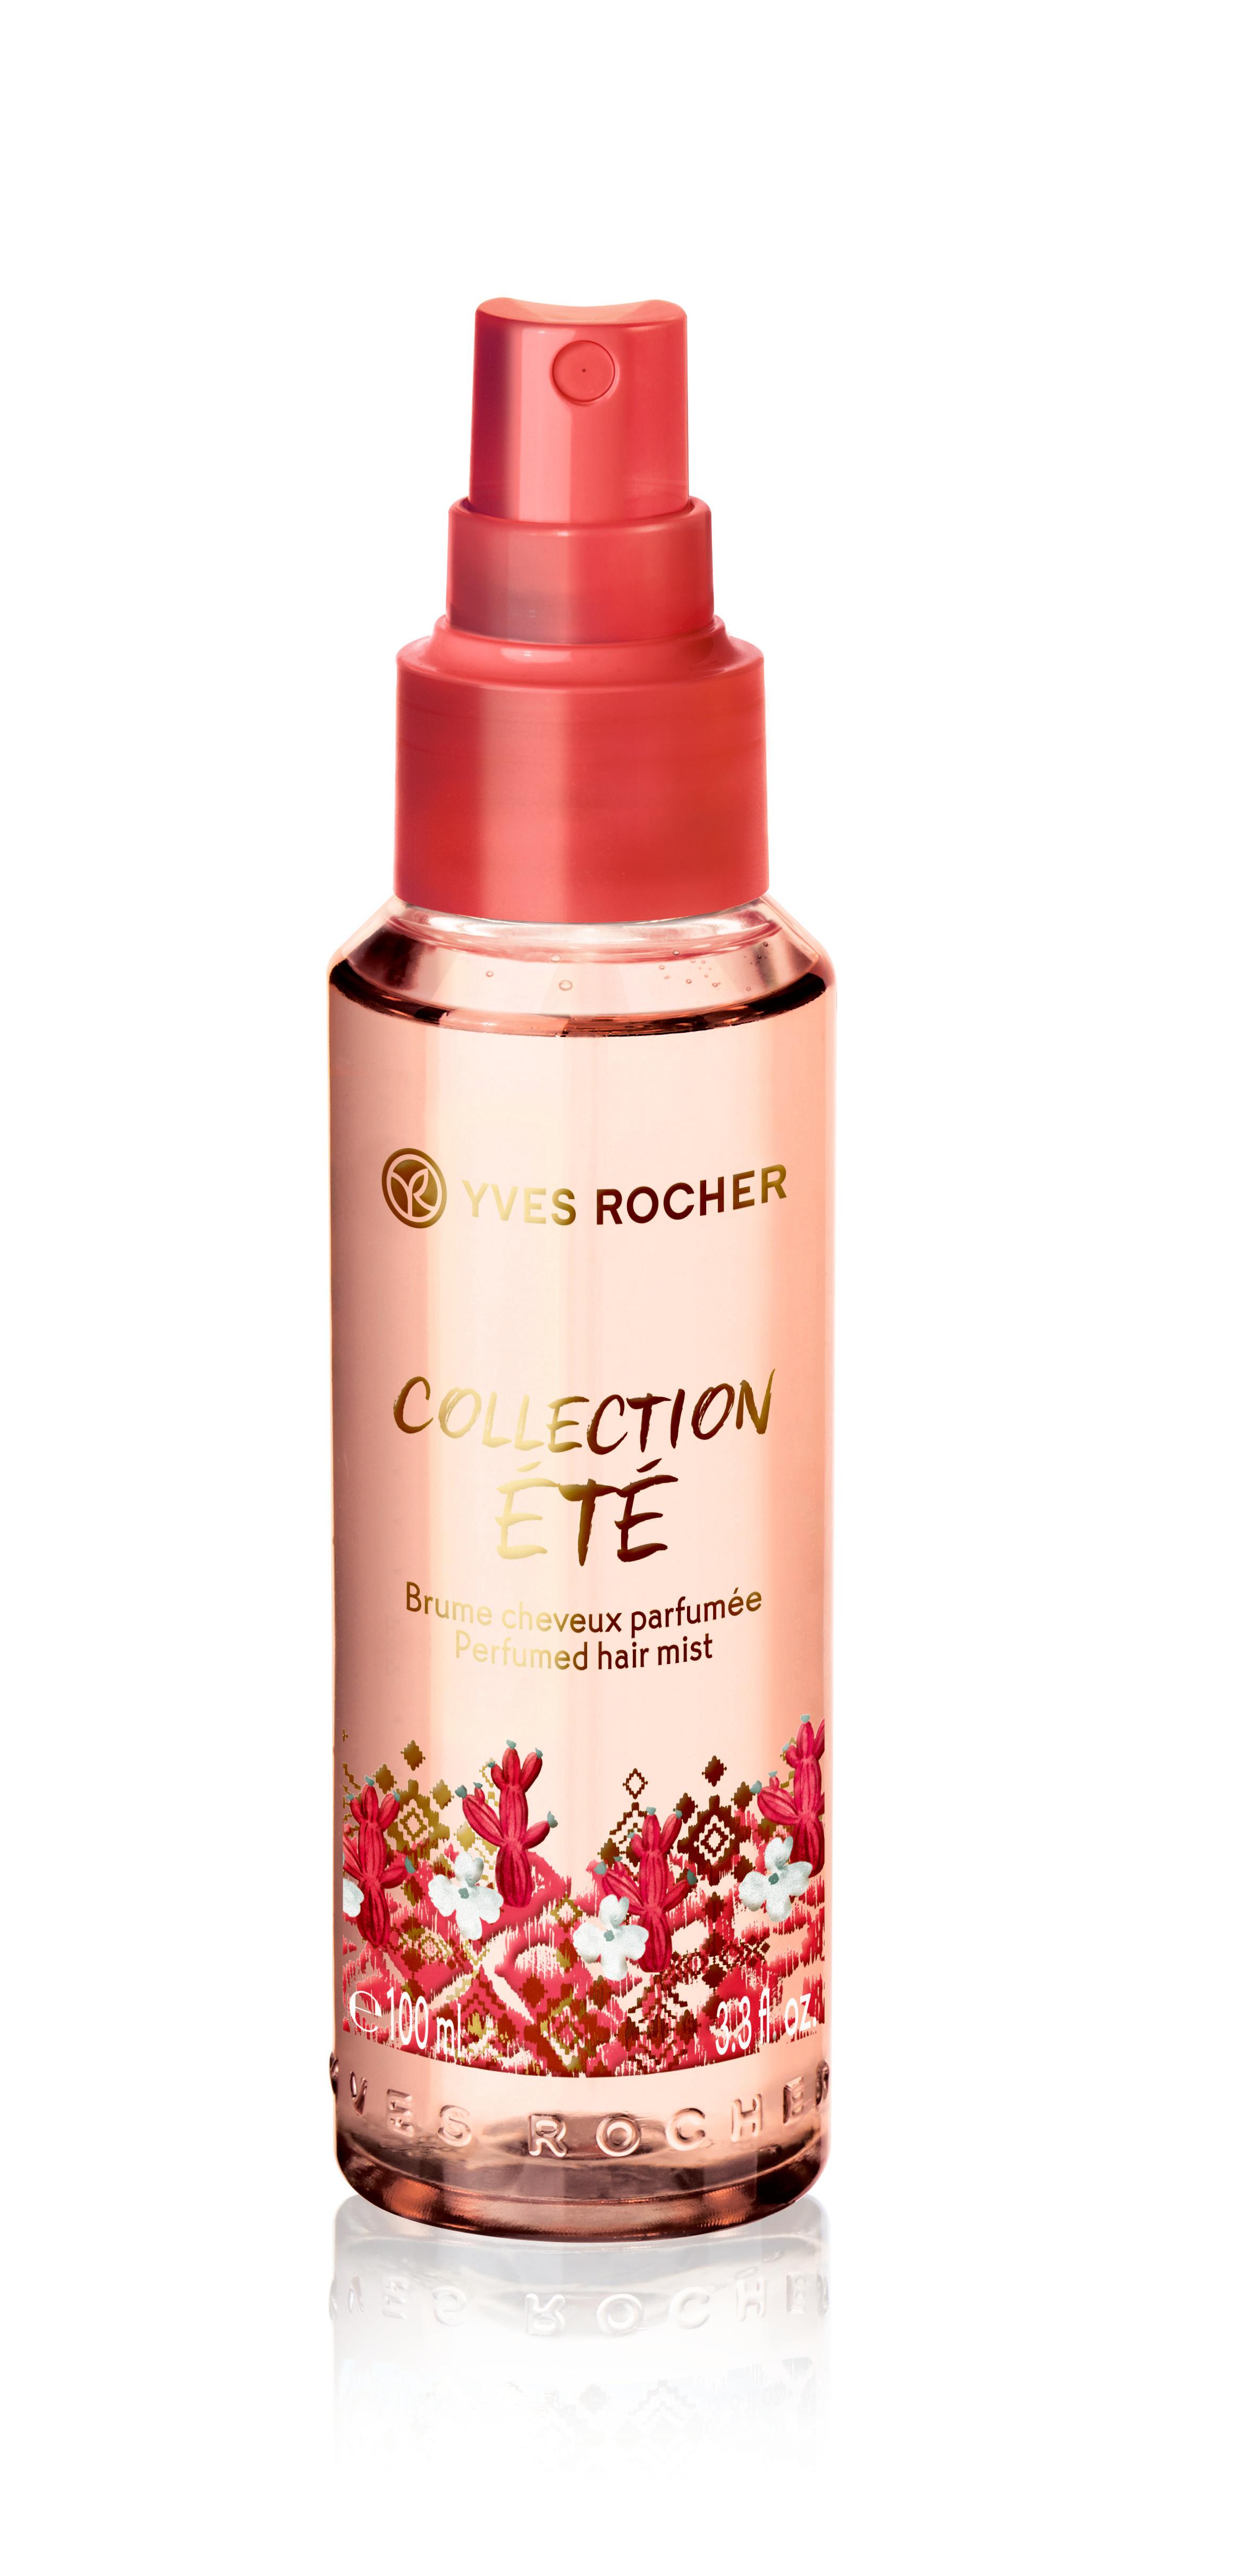 Yves Rocher – Perfumed Hair Mist